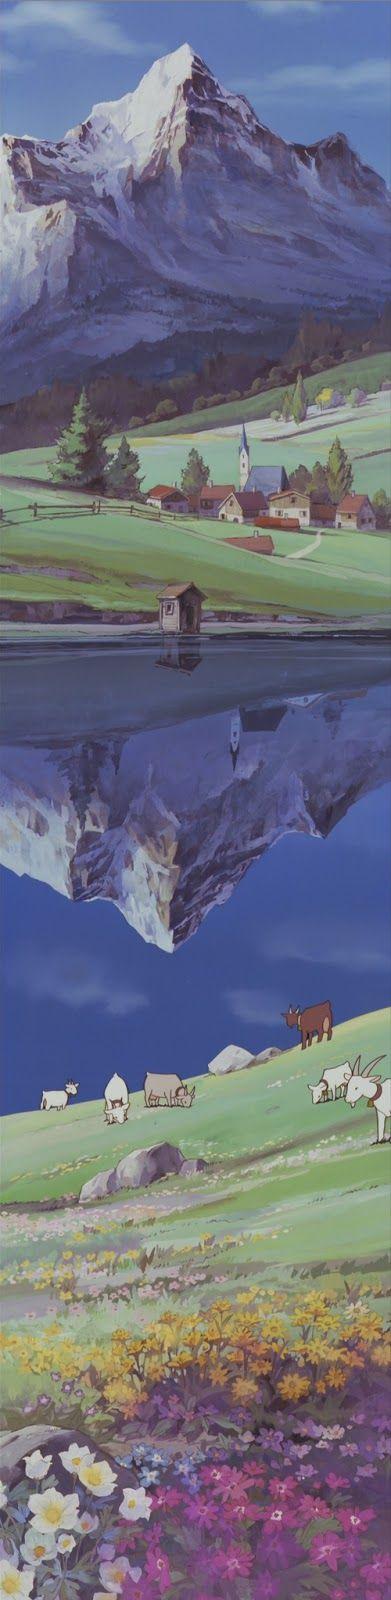 Los Alpes, en Heidi by Hayao Miyazaki